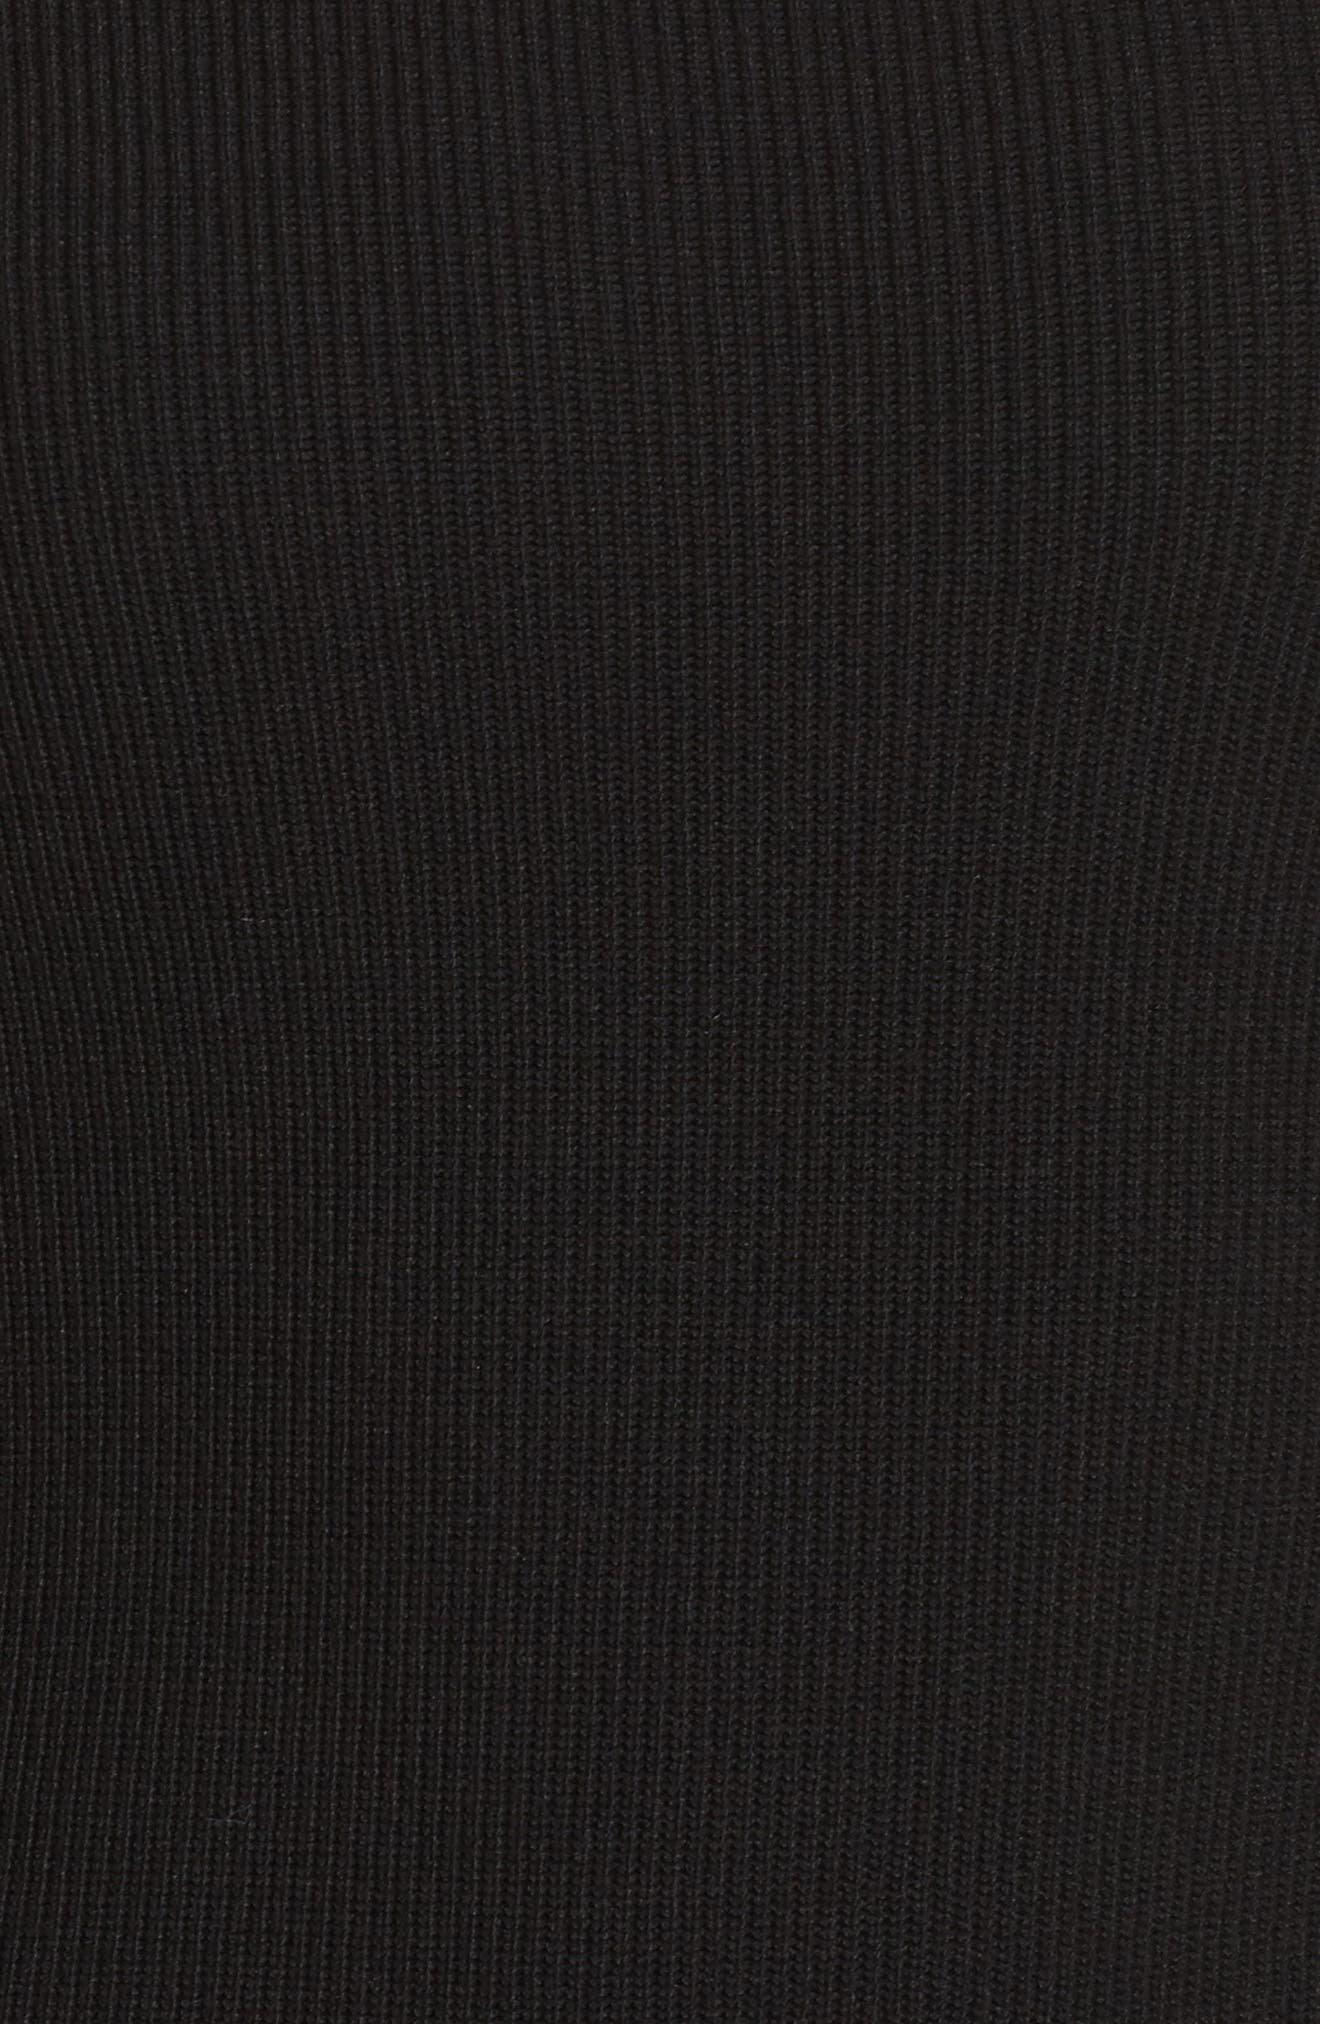 Off the Shoulder Midi Sweater Dress,                             Alternate thumbnail 5, color,                             001